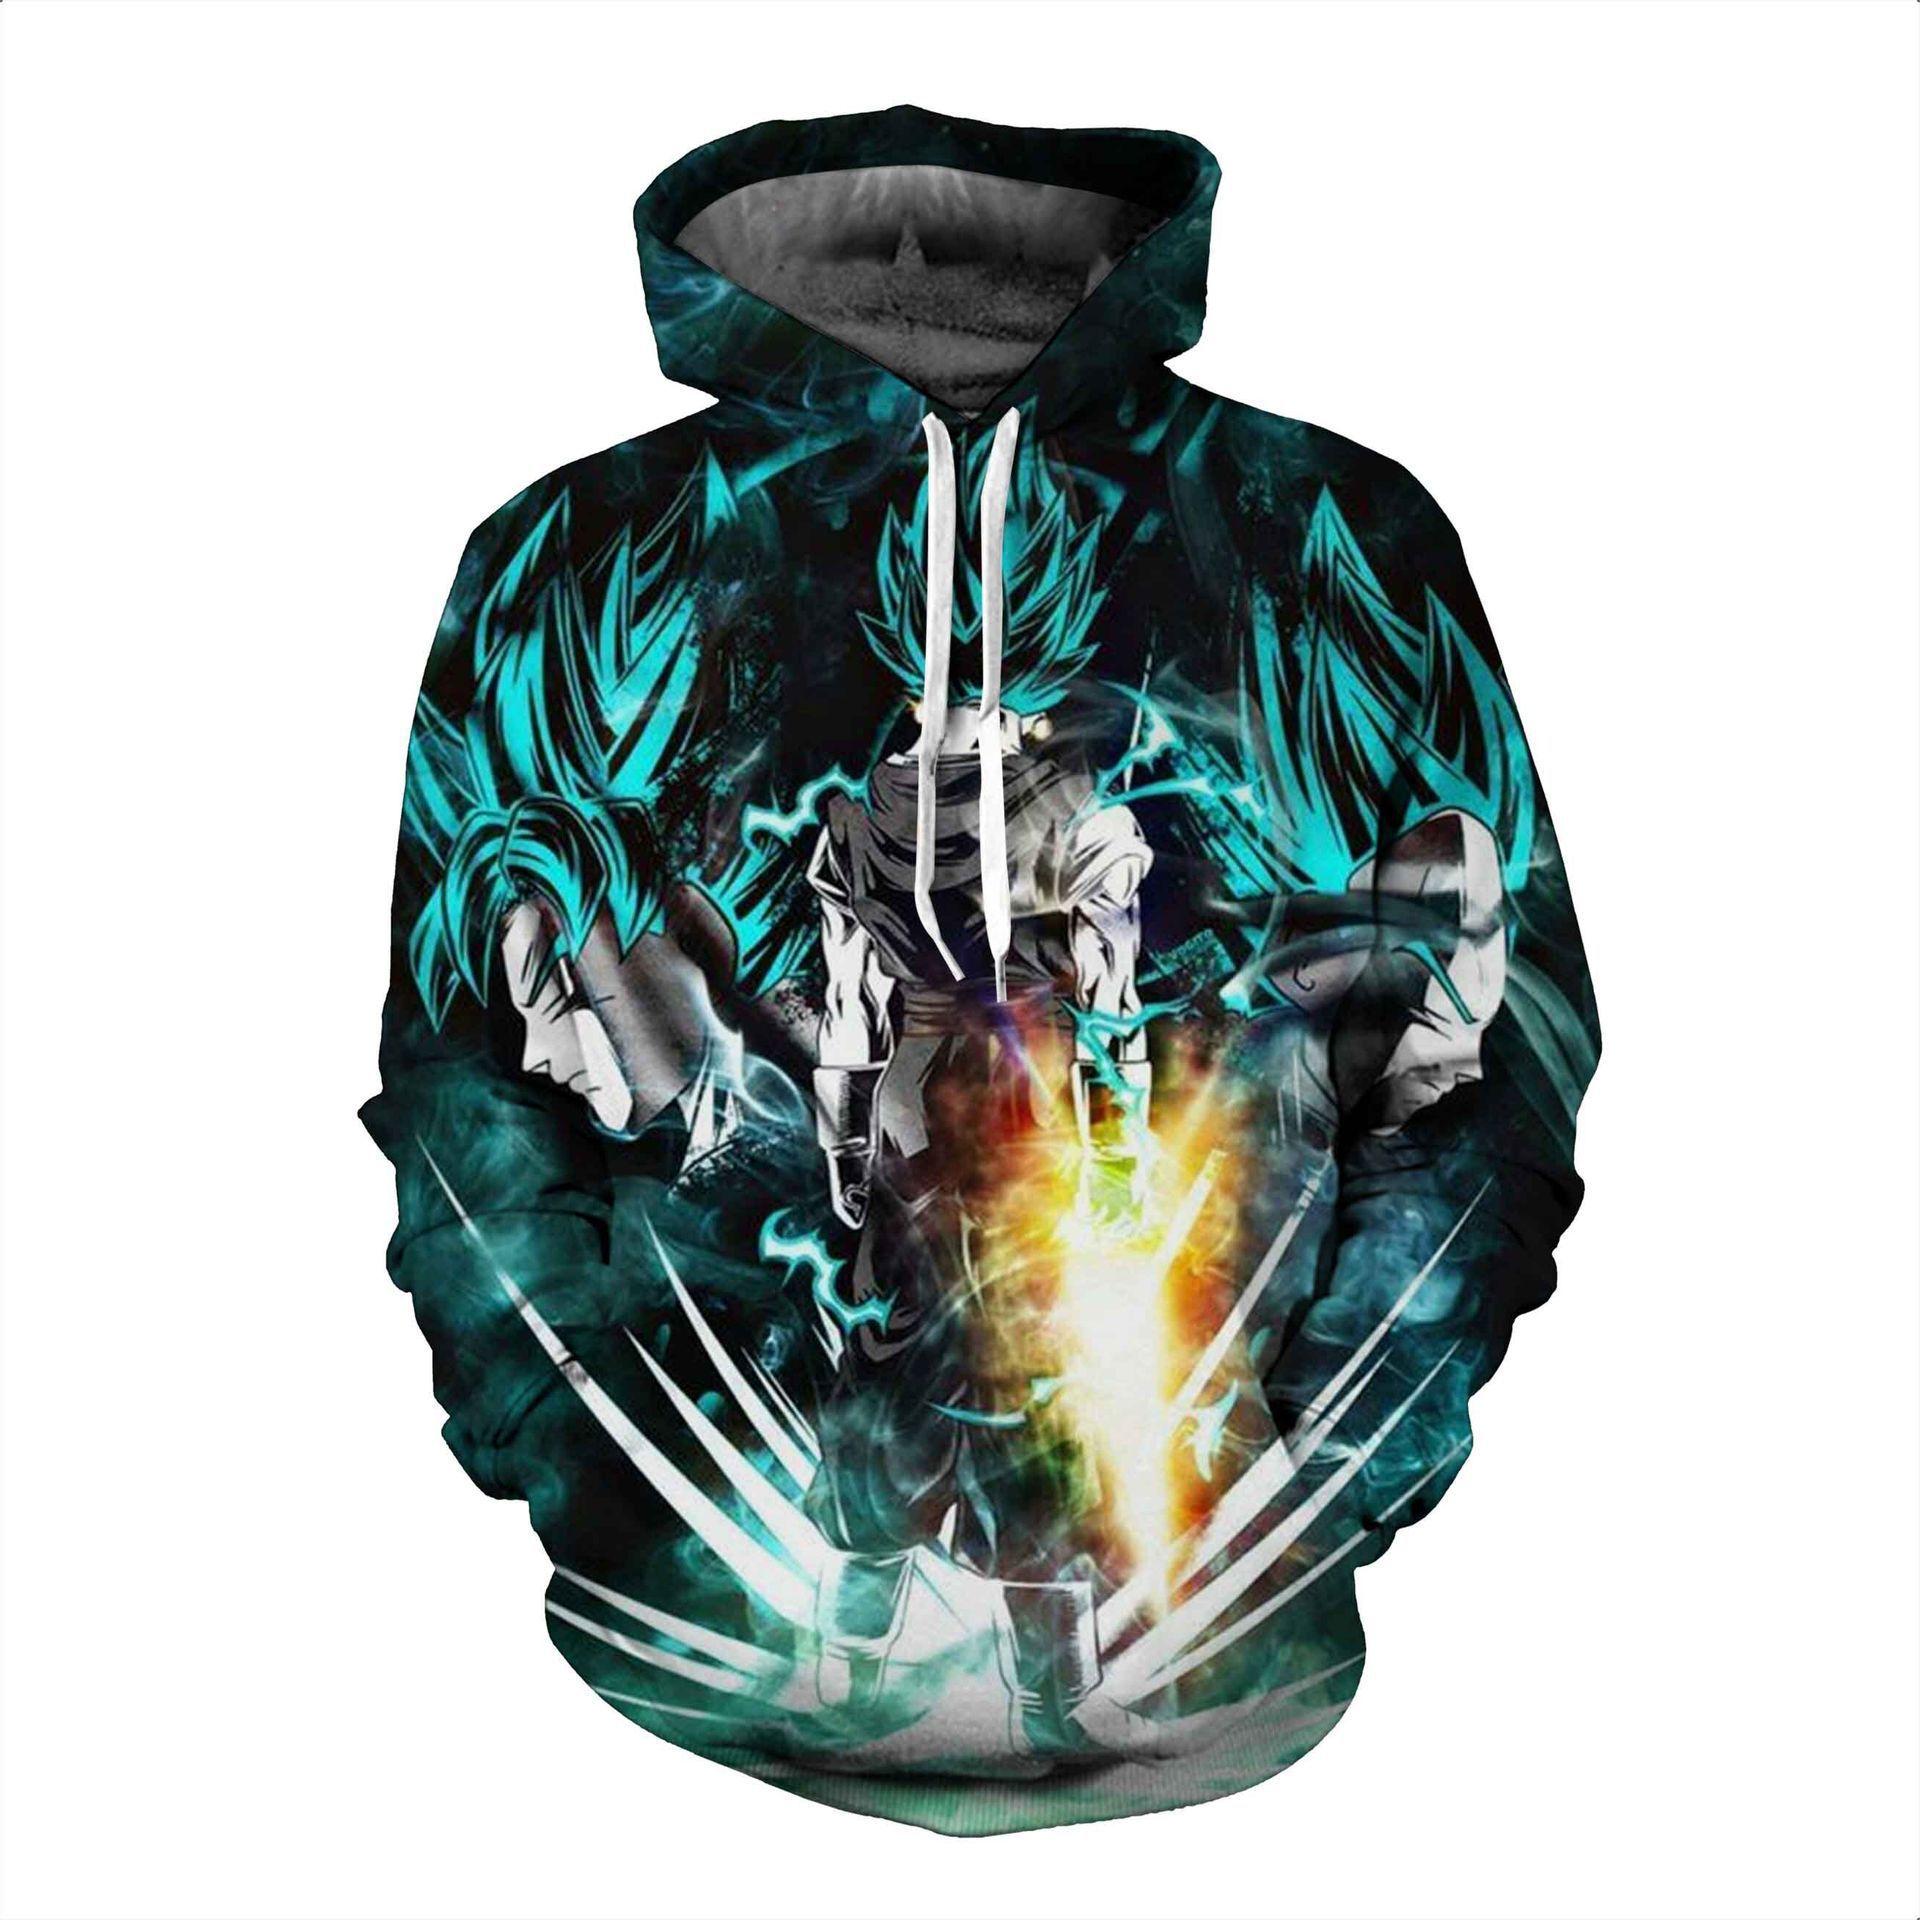 Anime Hoodies Dragon Ball Z Pocket Hooded Sweatshirts Kid Goku 3D Hoodies Pullovers Men Women Long Sleeve Outerwear New Hoodie